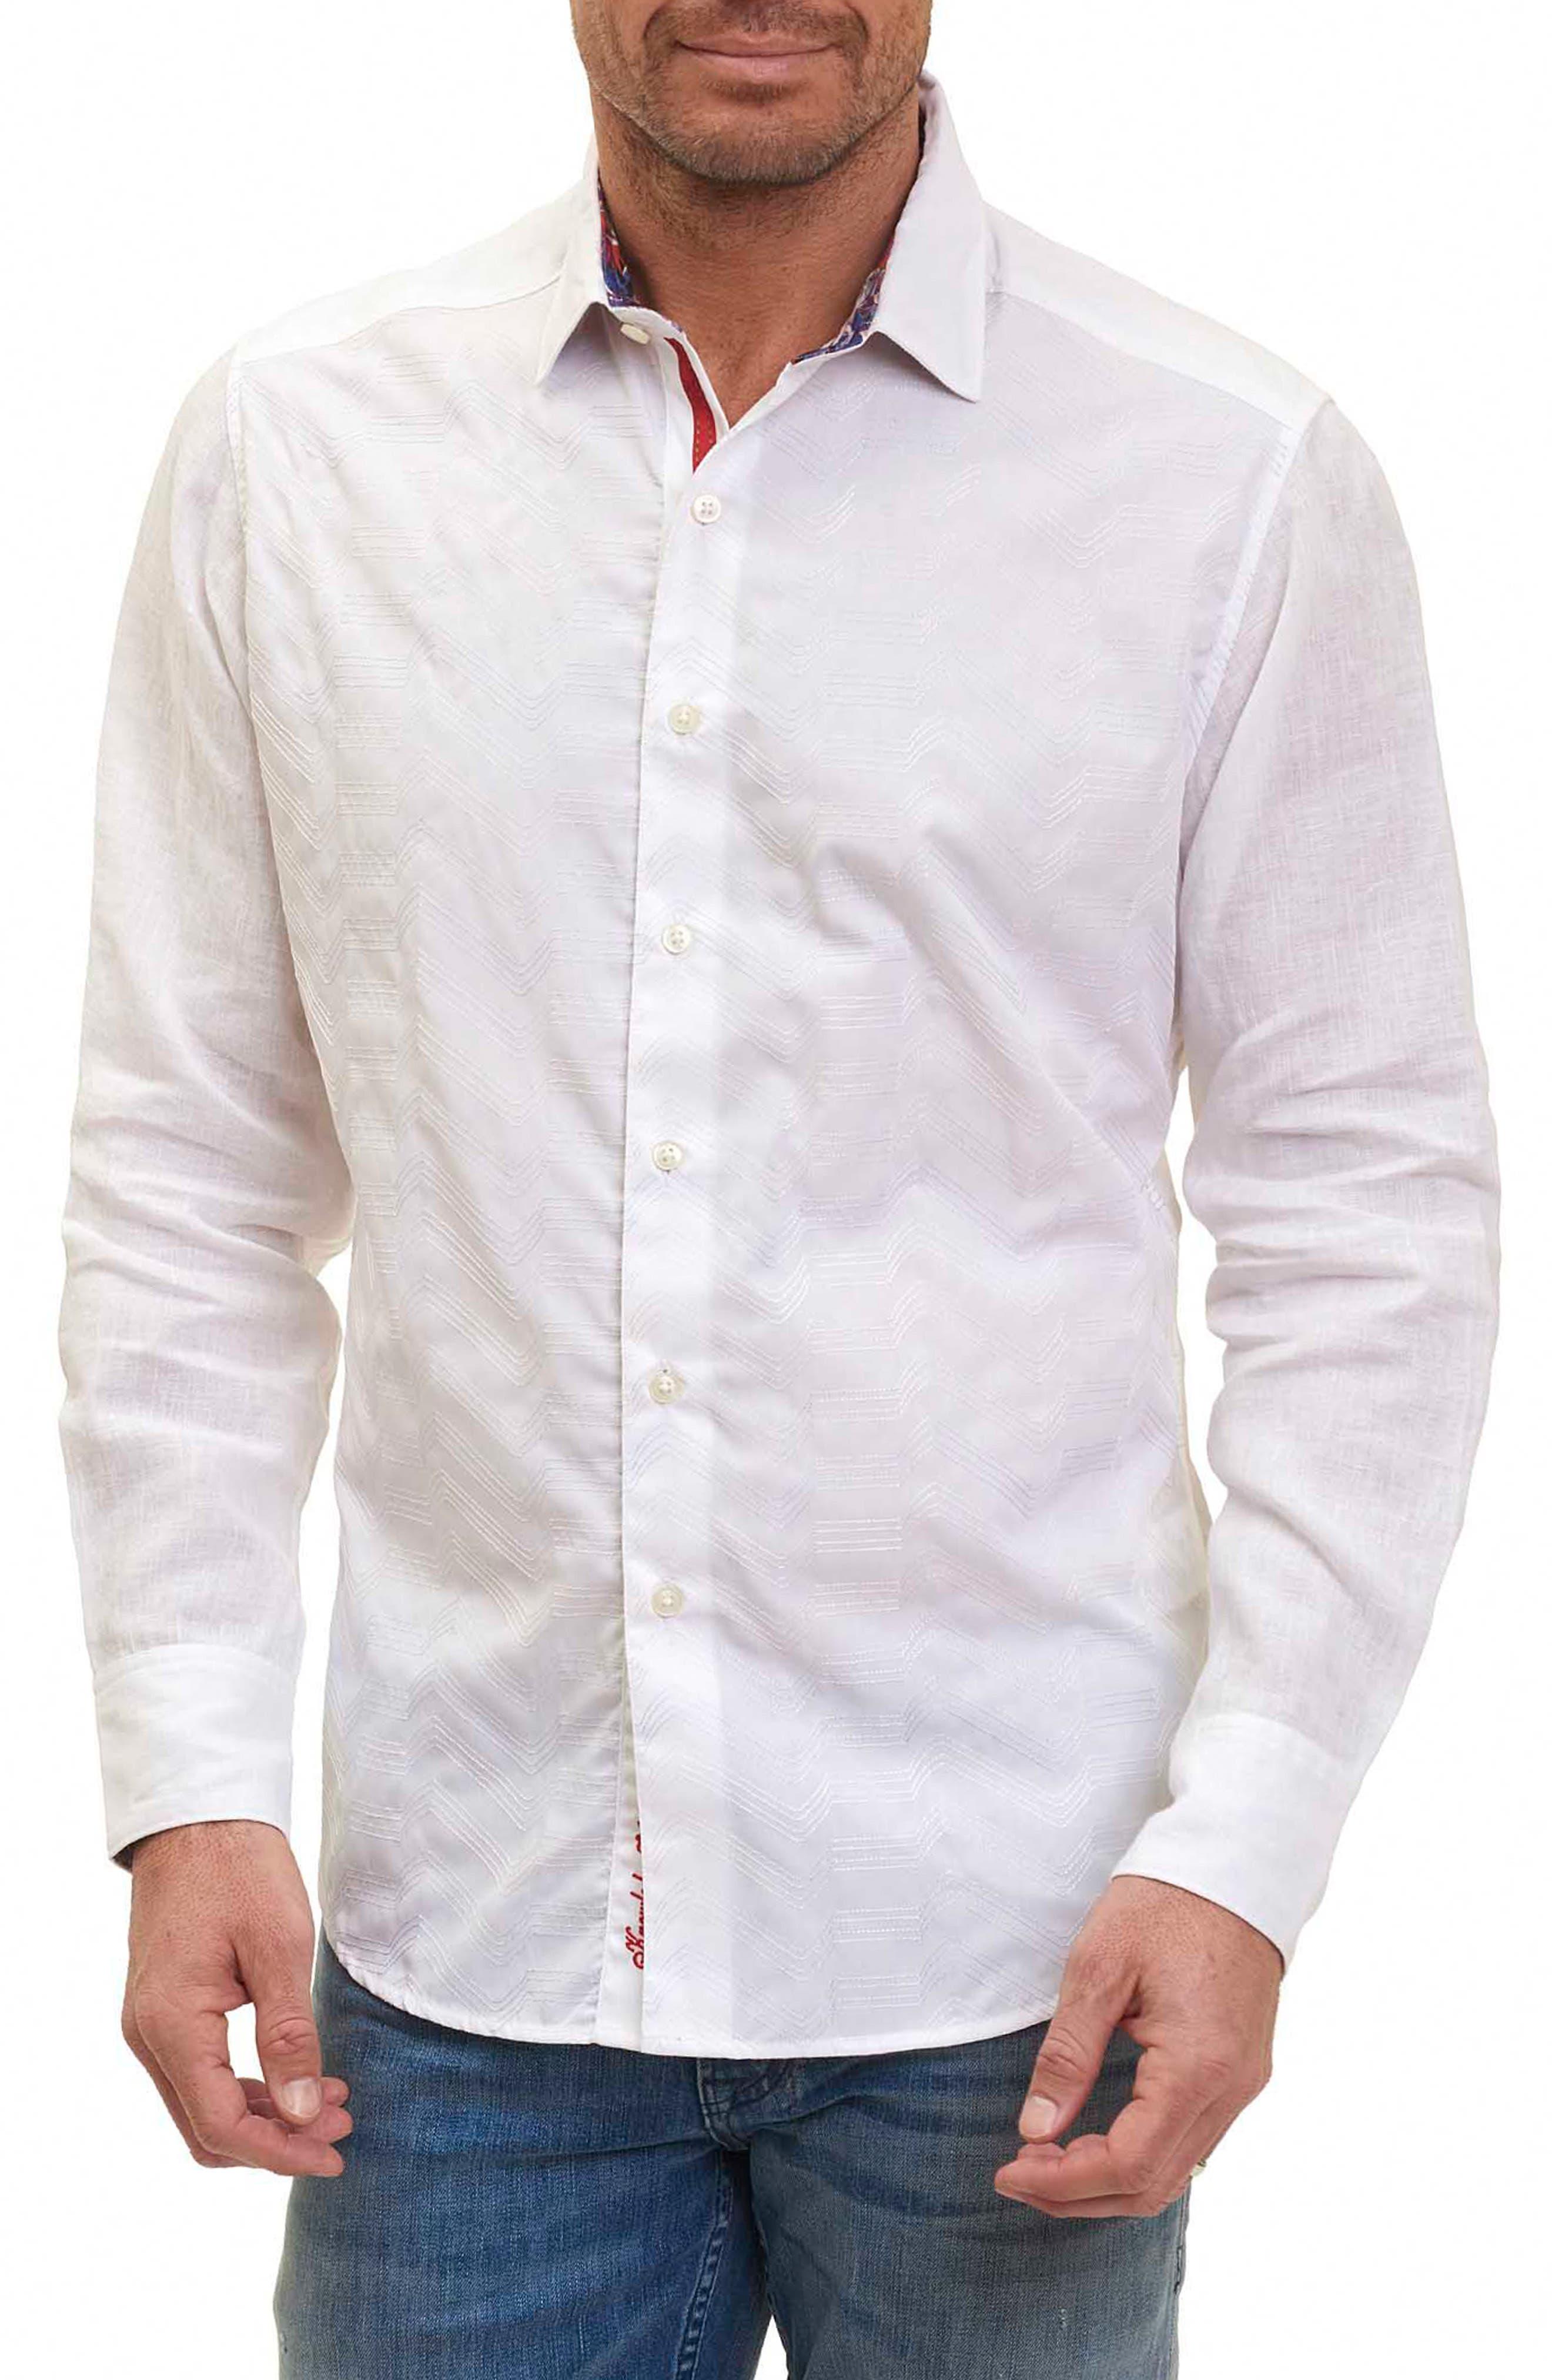 Shirts for Men, Men's Linen Shirts | Nordstrom